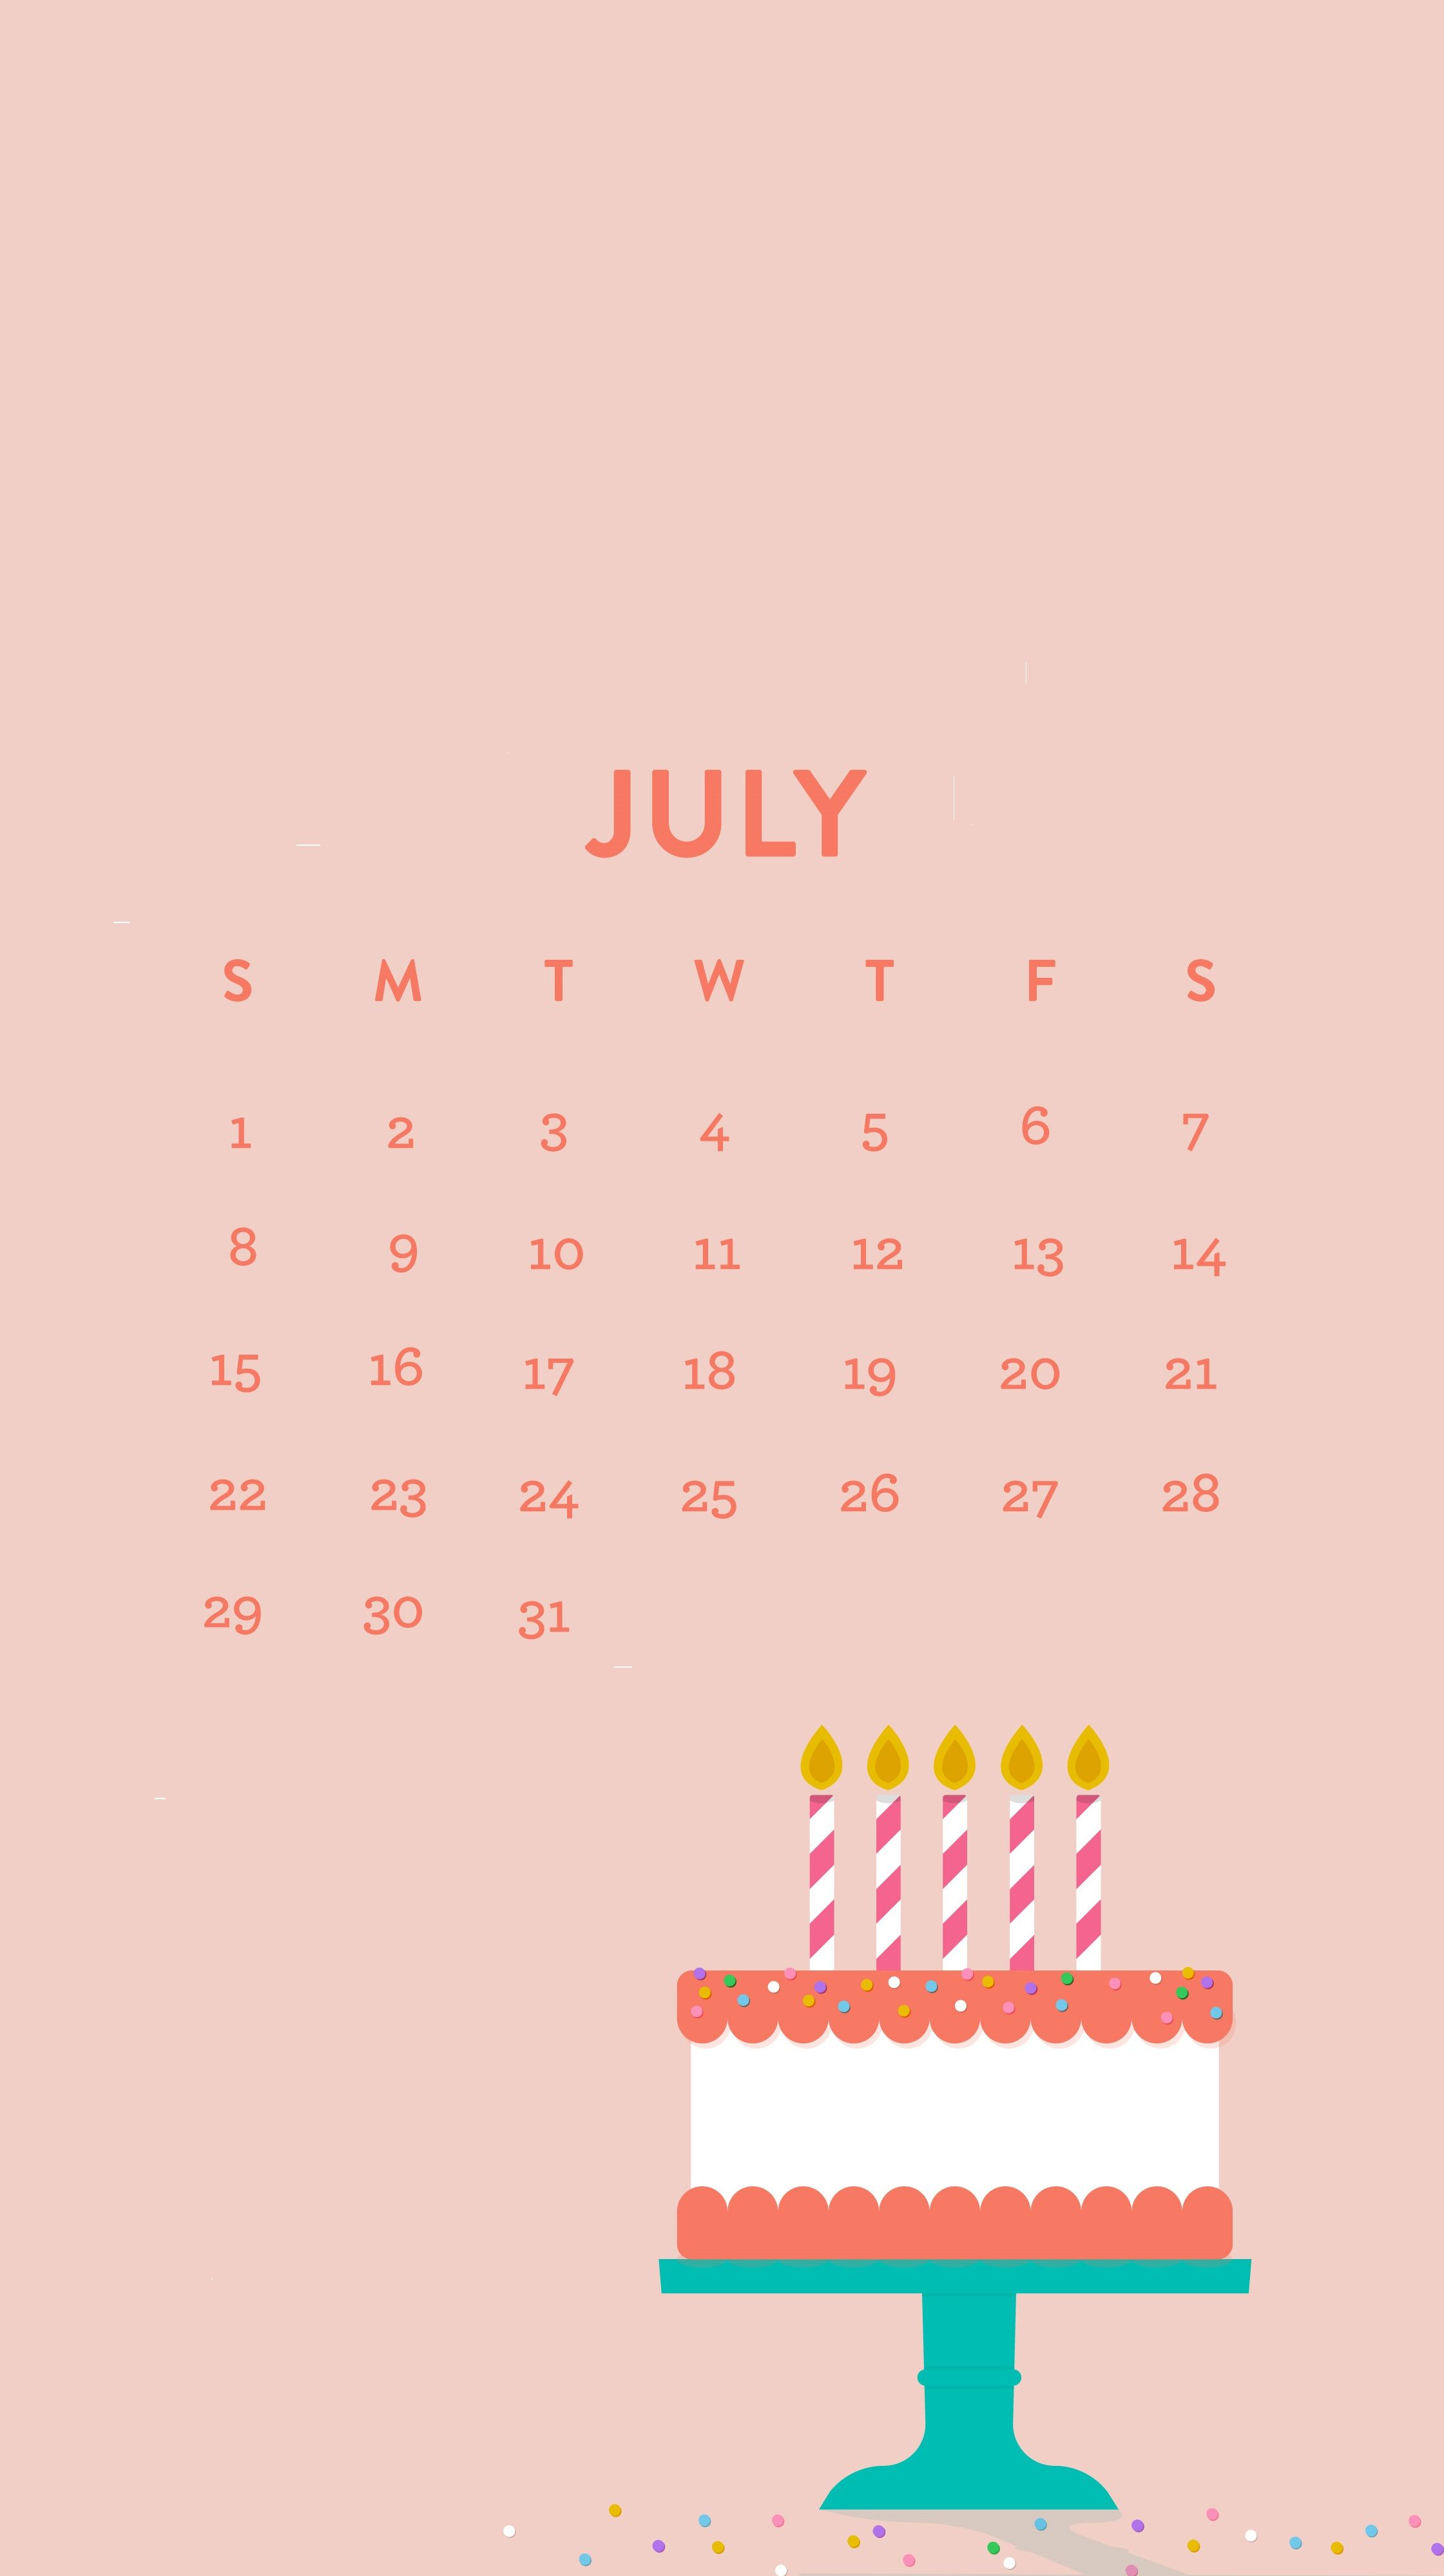 Free July 2018 iPhone Calendar Wallpapers | Calendar 2018 | Calendar wallpaper, Calendar, Free ...